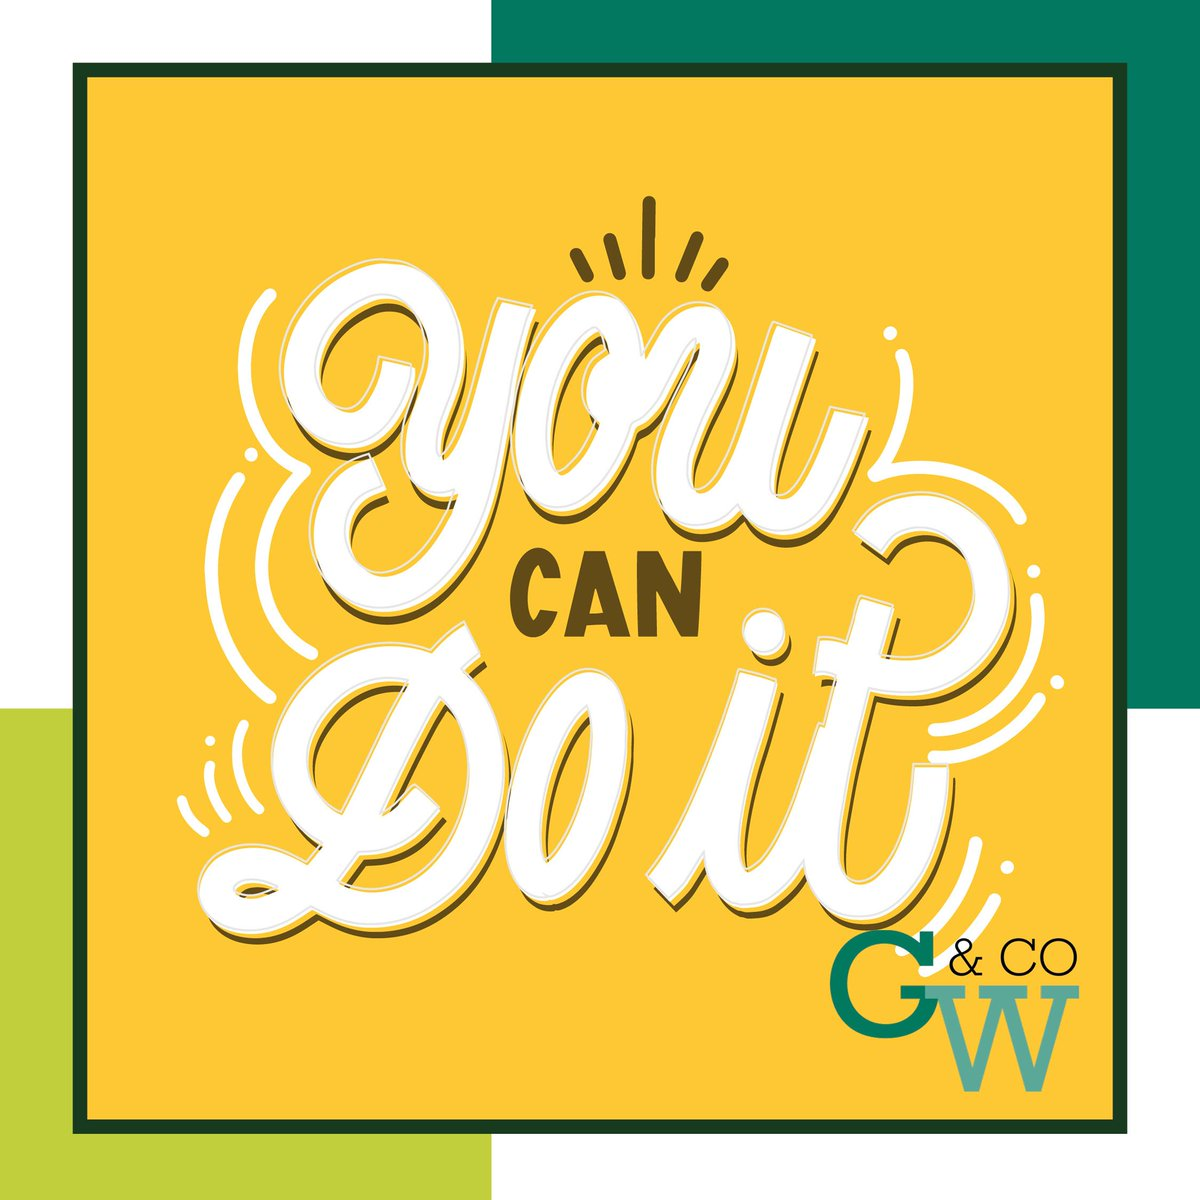 Positive Mindset ✔  Ambition ✔  Effort ✔   #gwaccountancy #businessadvisers #accountancy https://t.co/JBZjY5hiGa